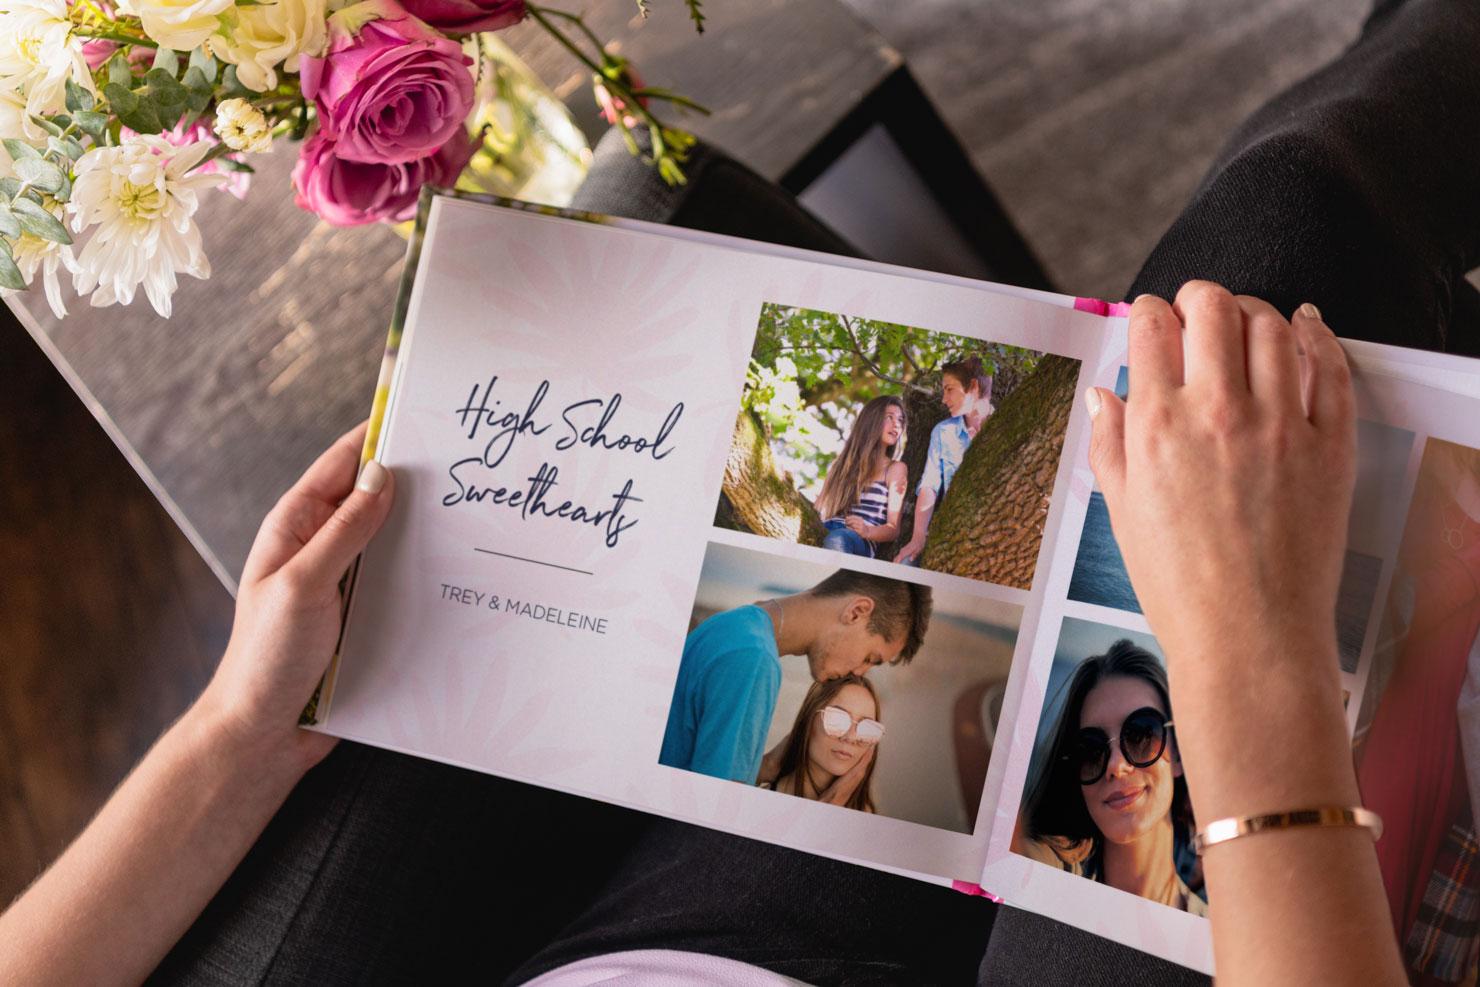 Creative Relationship Scrapbook Ideas 6 Anniversary Photo Book Ideas To Cherish Your Relationship